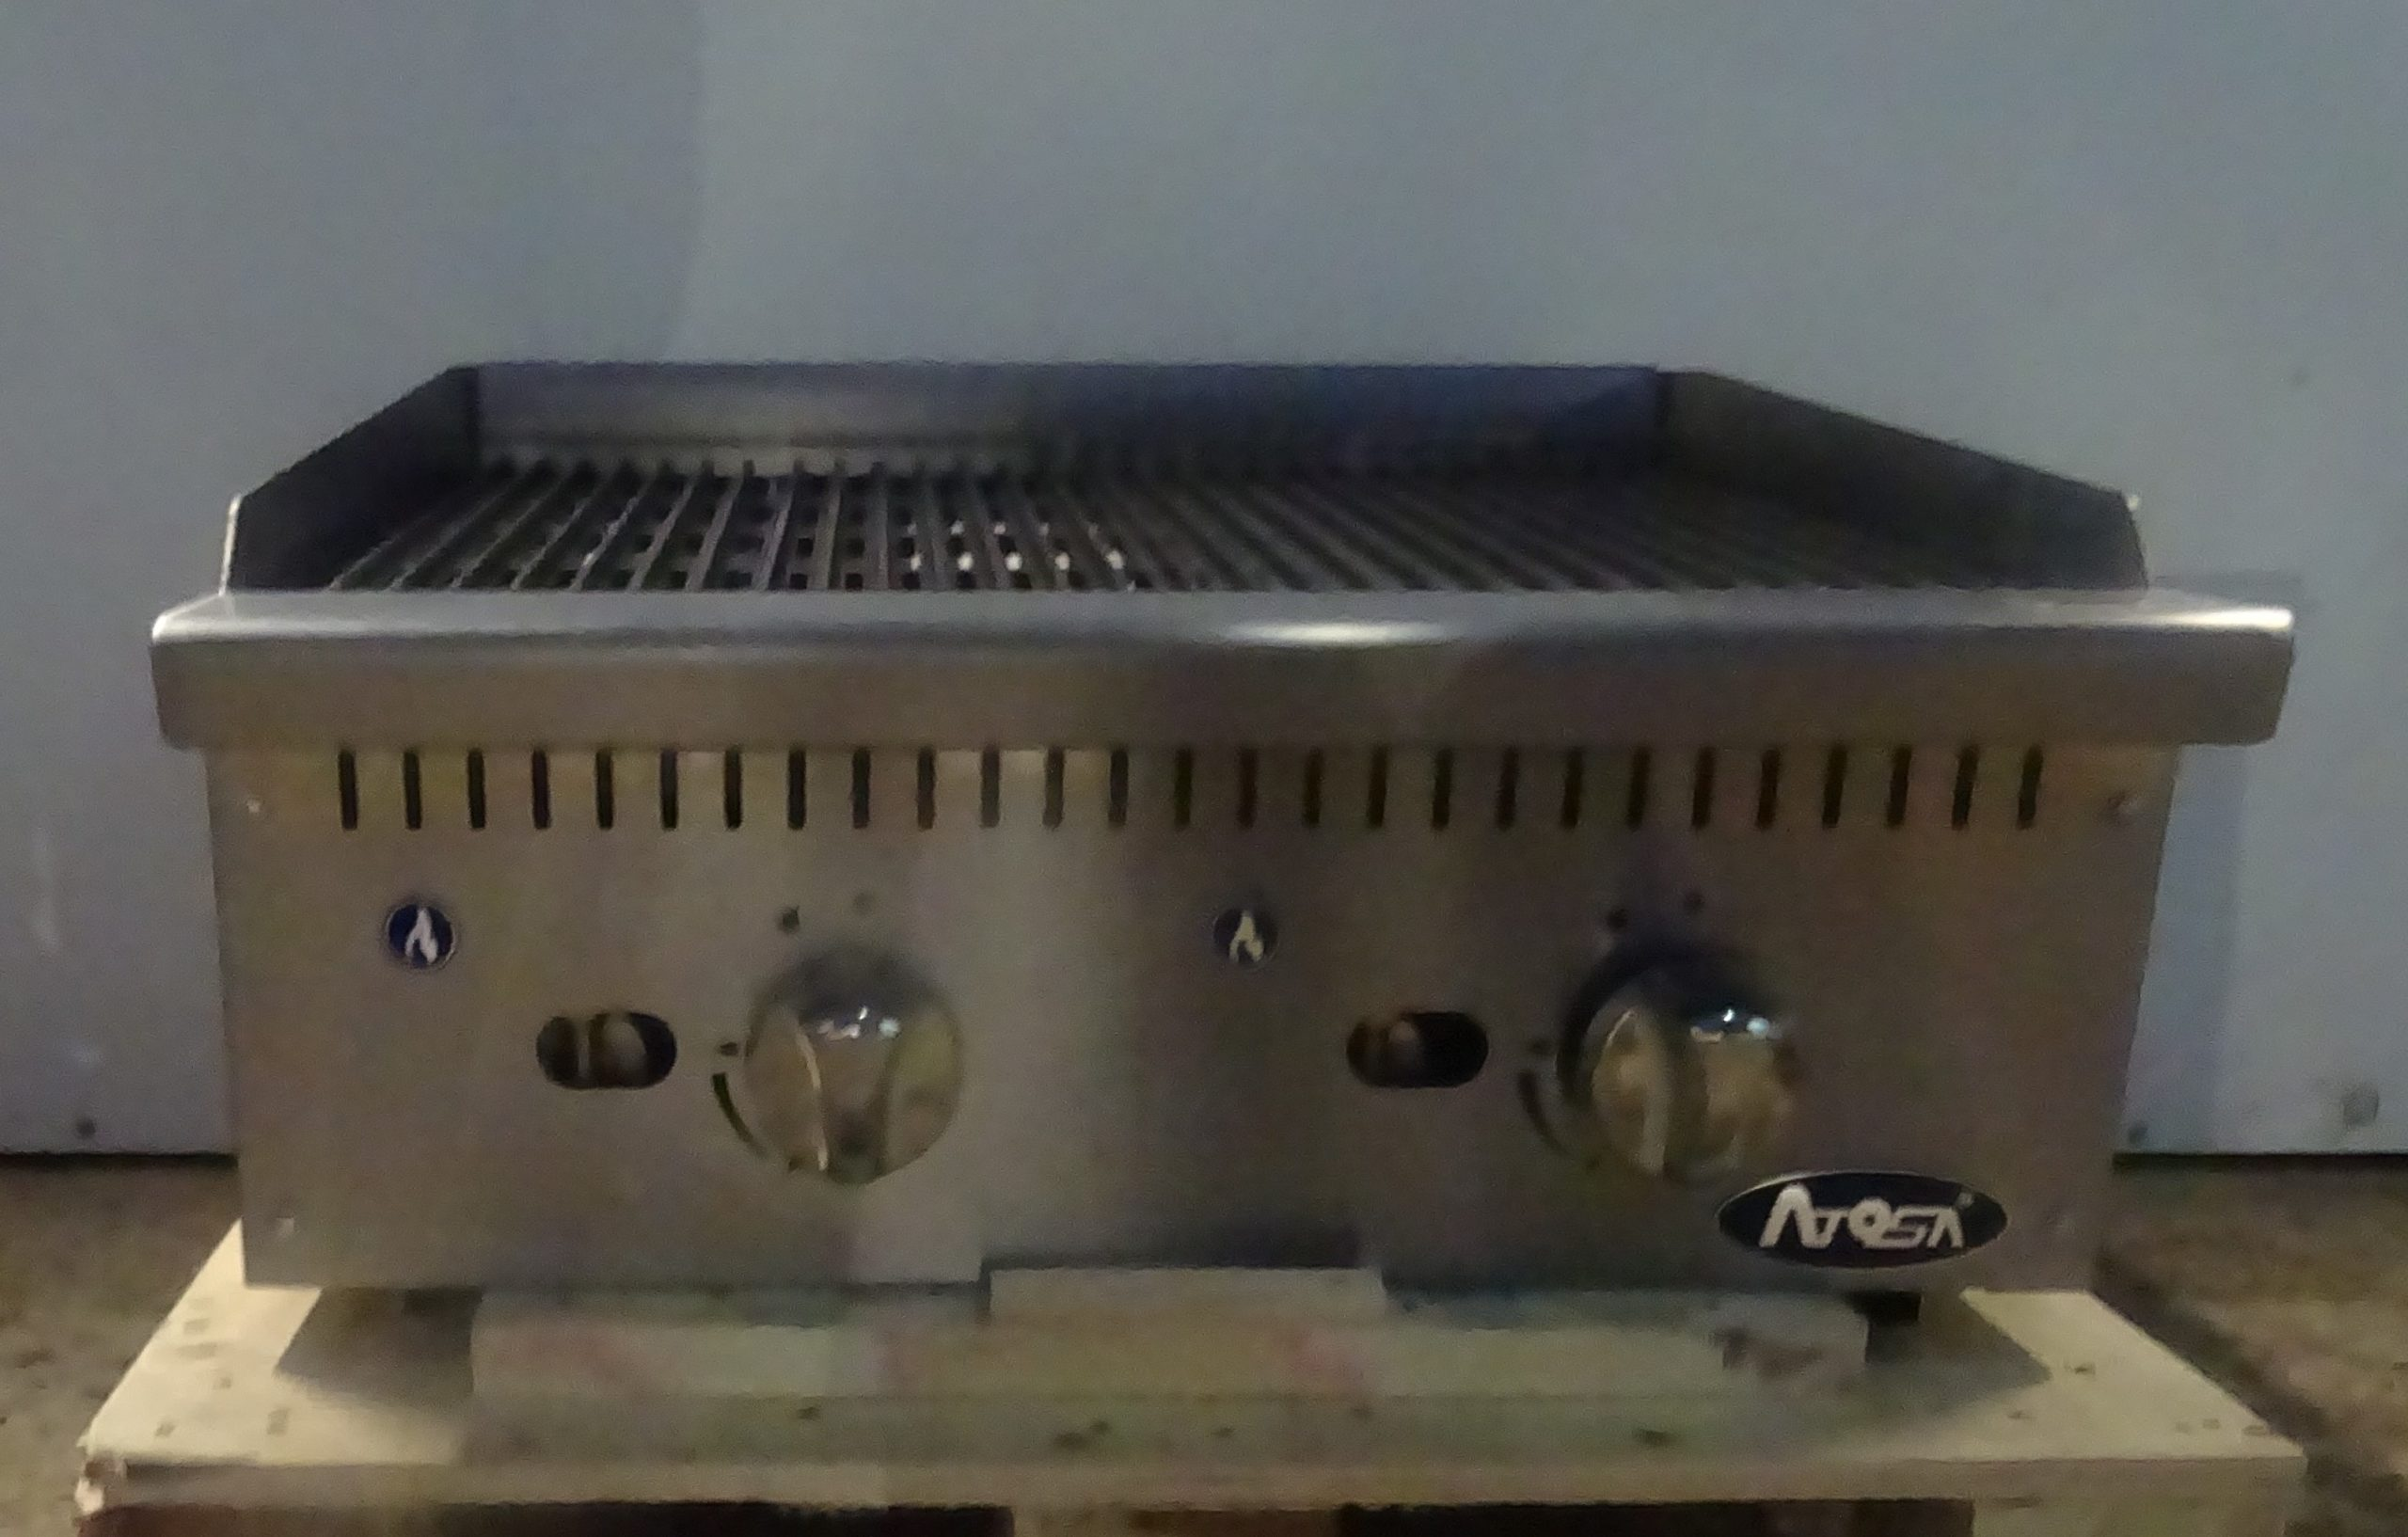 ATOSA ATCB-24 Char Grill